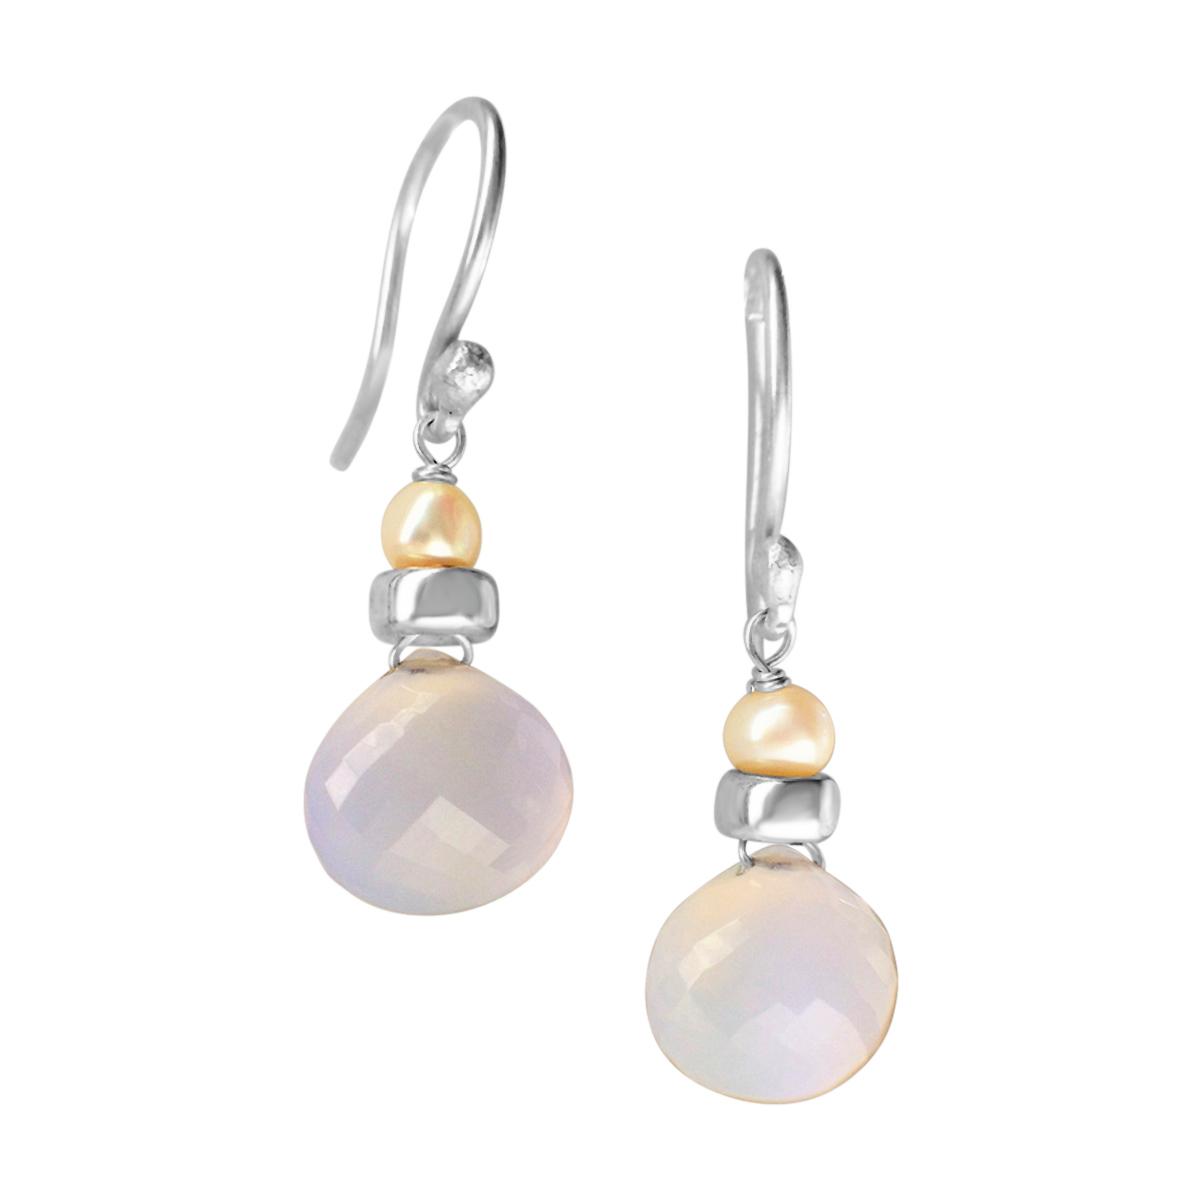 Perfume Bottle chalcedony earrings